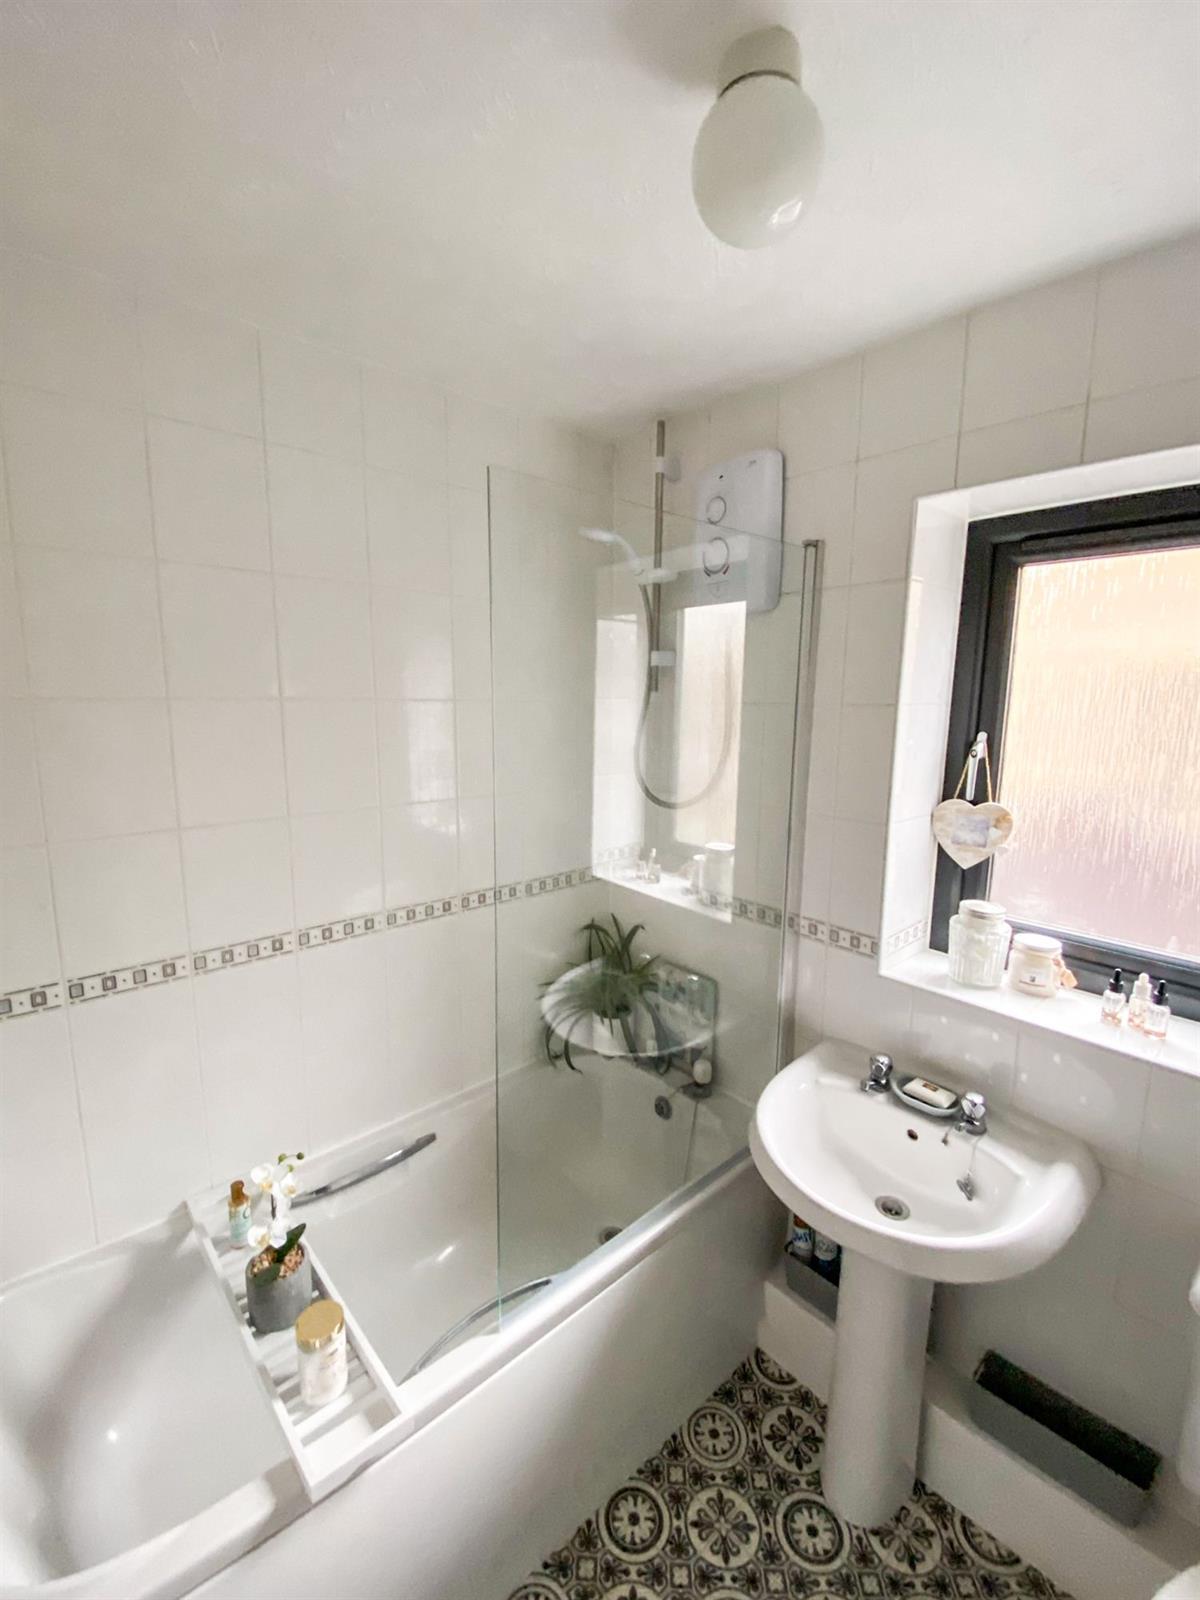 To Let - 2 bedroom Semi-detached house, West Green Drive, Kirk Sandall, Doncaster - £675 pcm